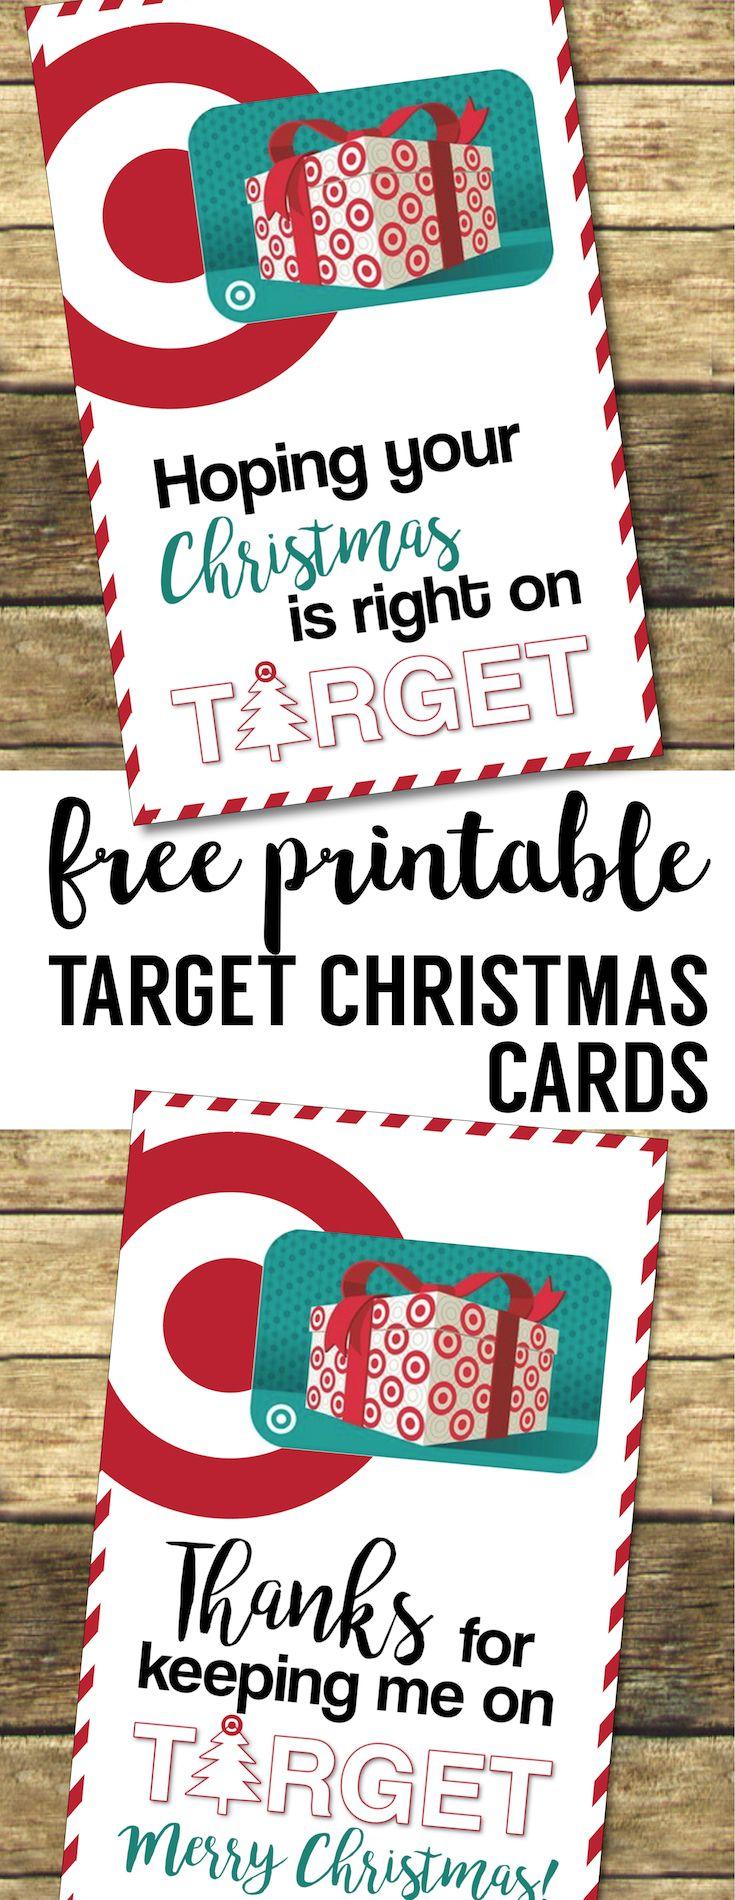 Target Christmas Gift Card Holders {Teachers, Friends, Neighbors} - Paper Trail Design #diychristmasgifts